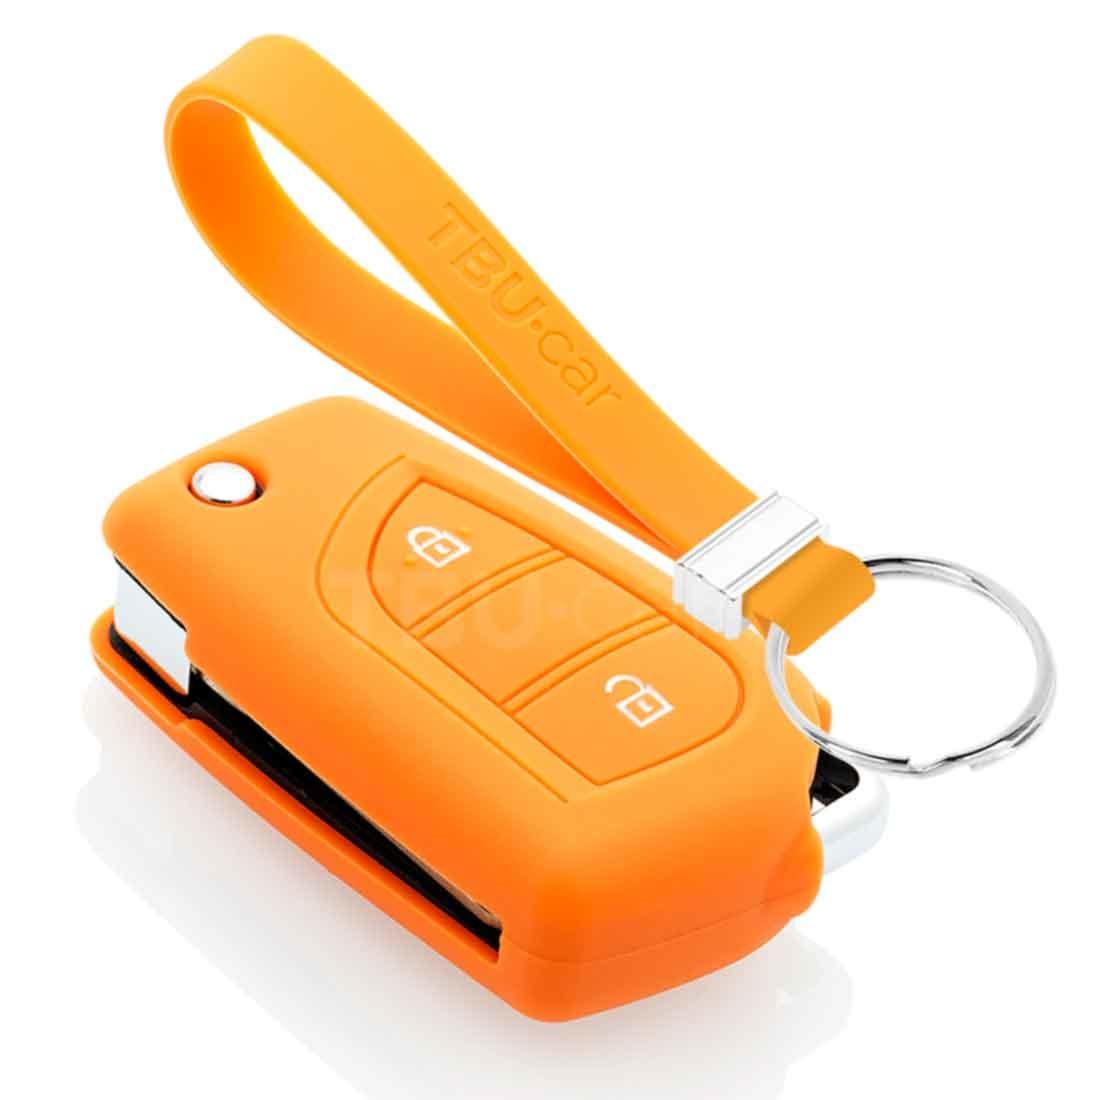 TBU car TBU car Funda Carcasa llave compatible con Citroën - Funda de Silicona - Cover de Llave Coche - Naranja